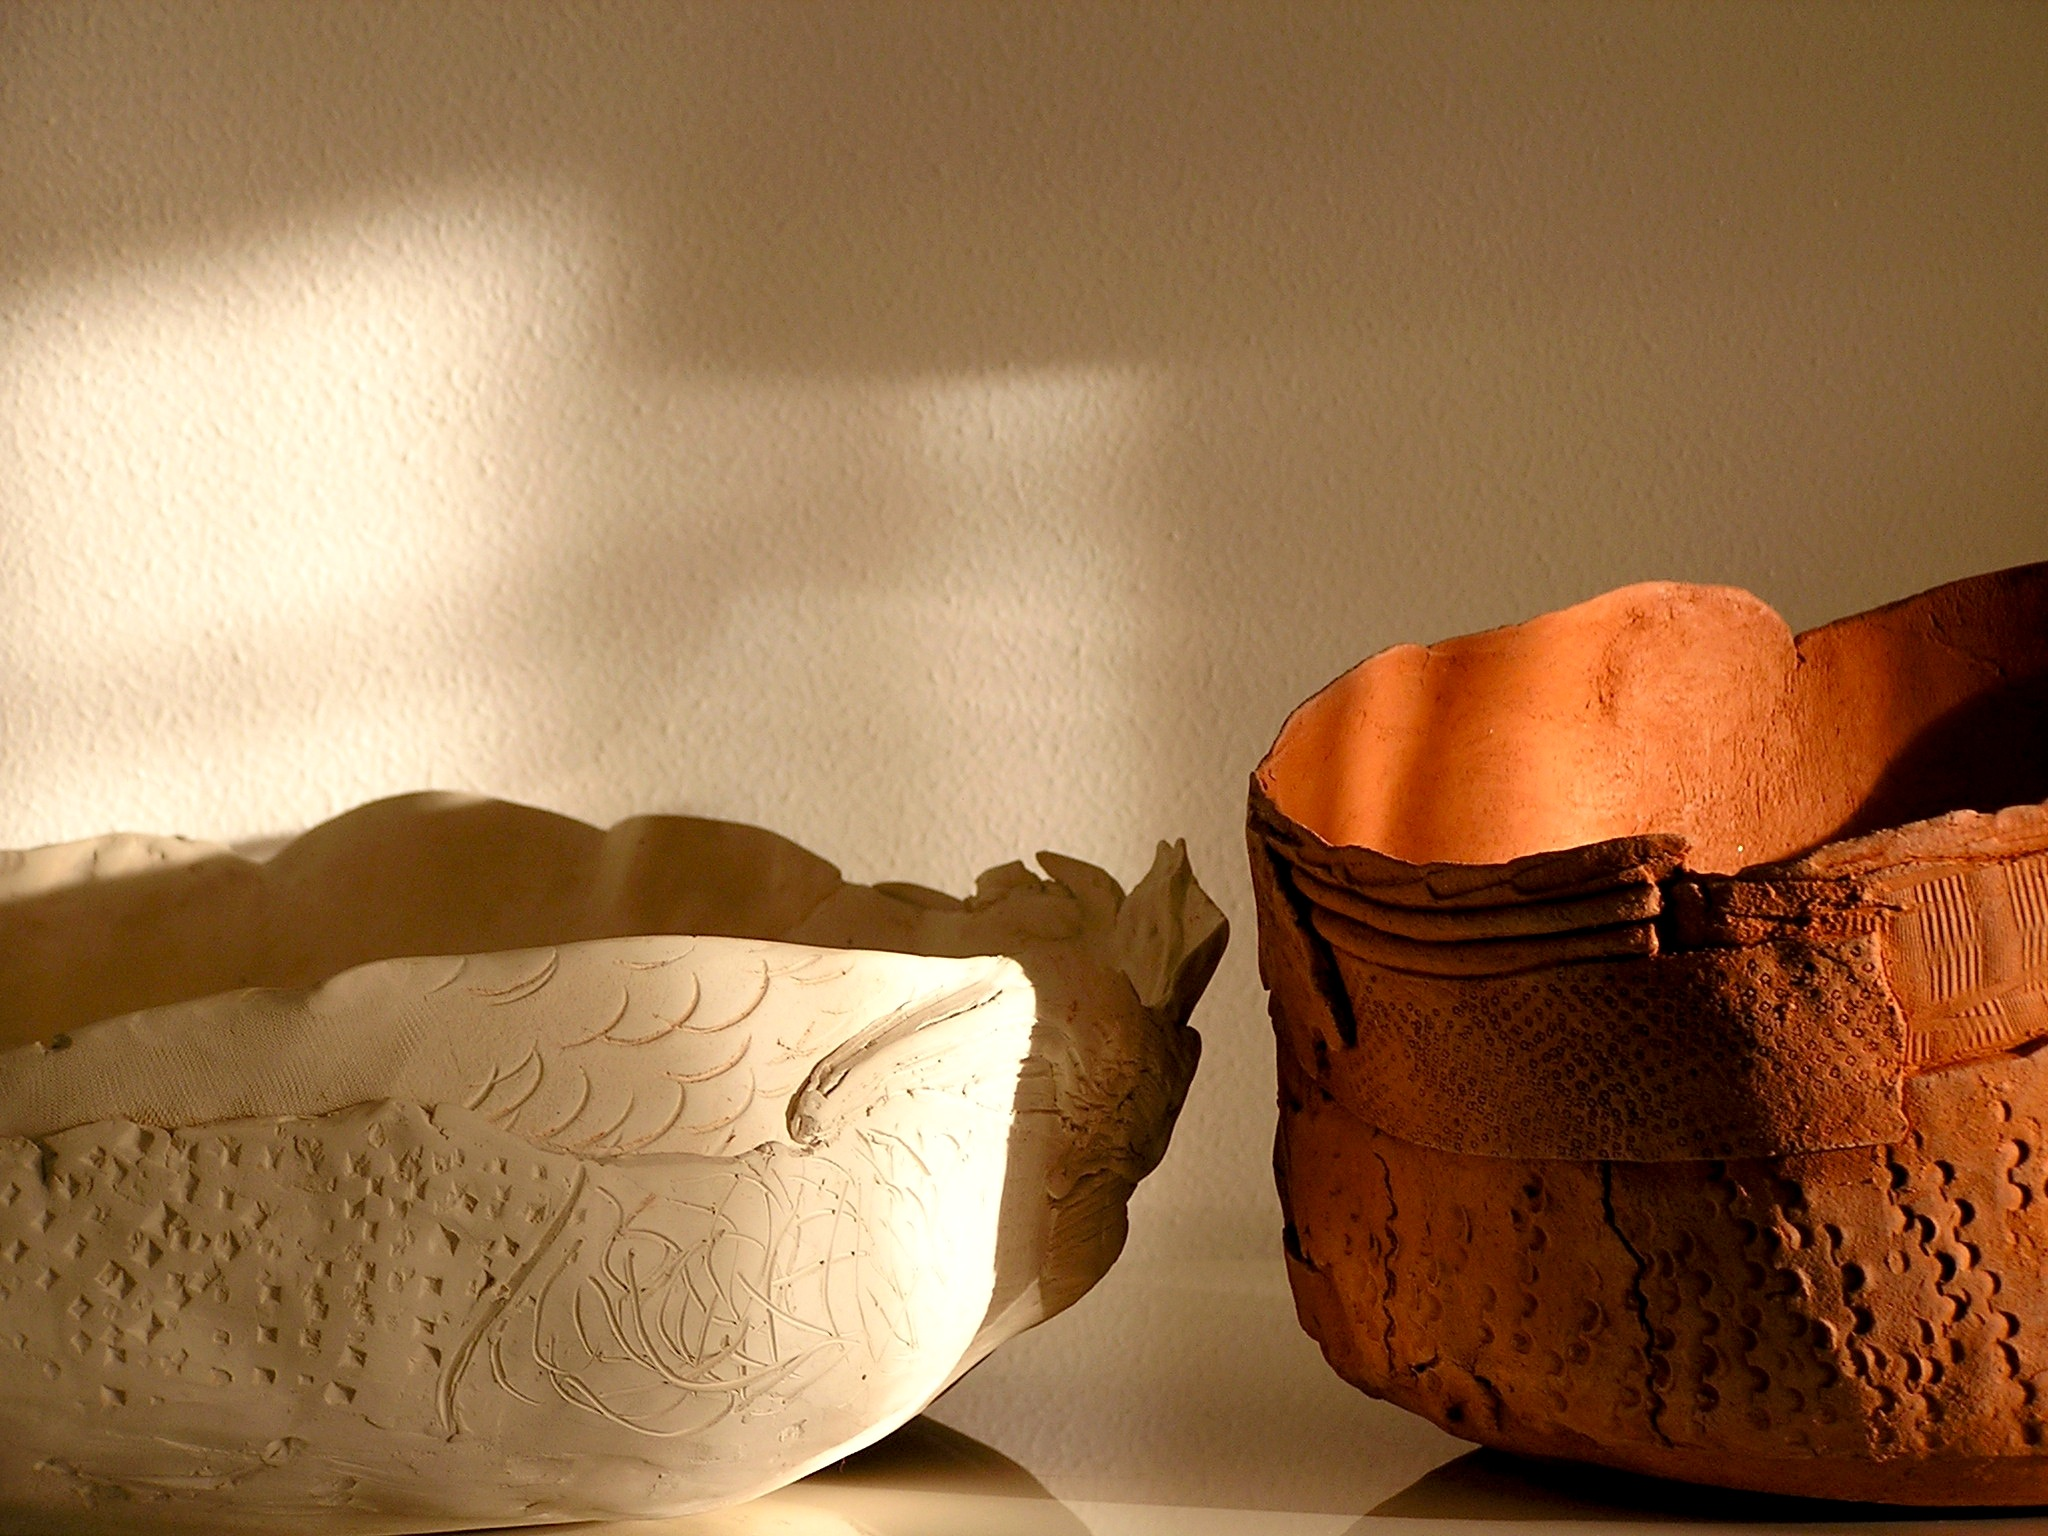 Ciotola in ceramica senza smalto